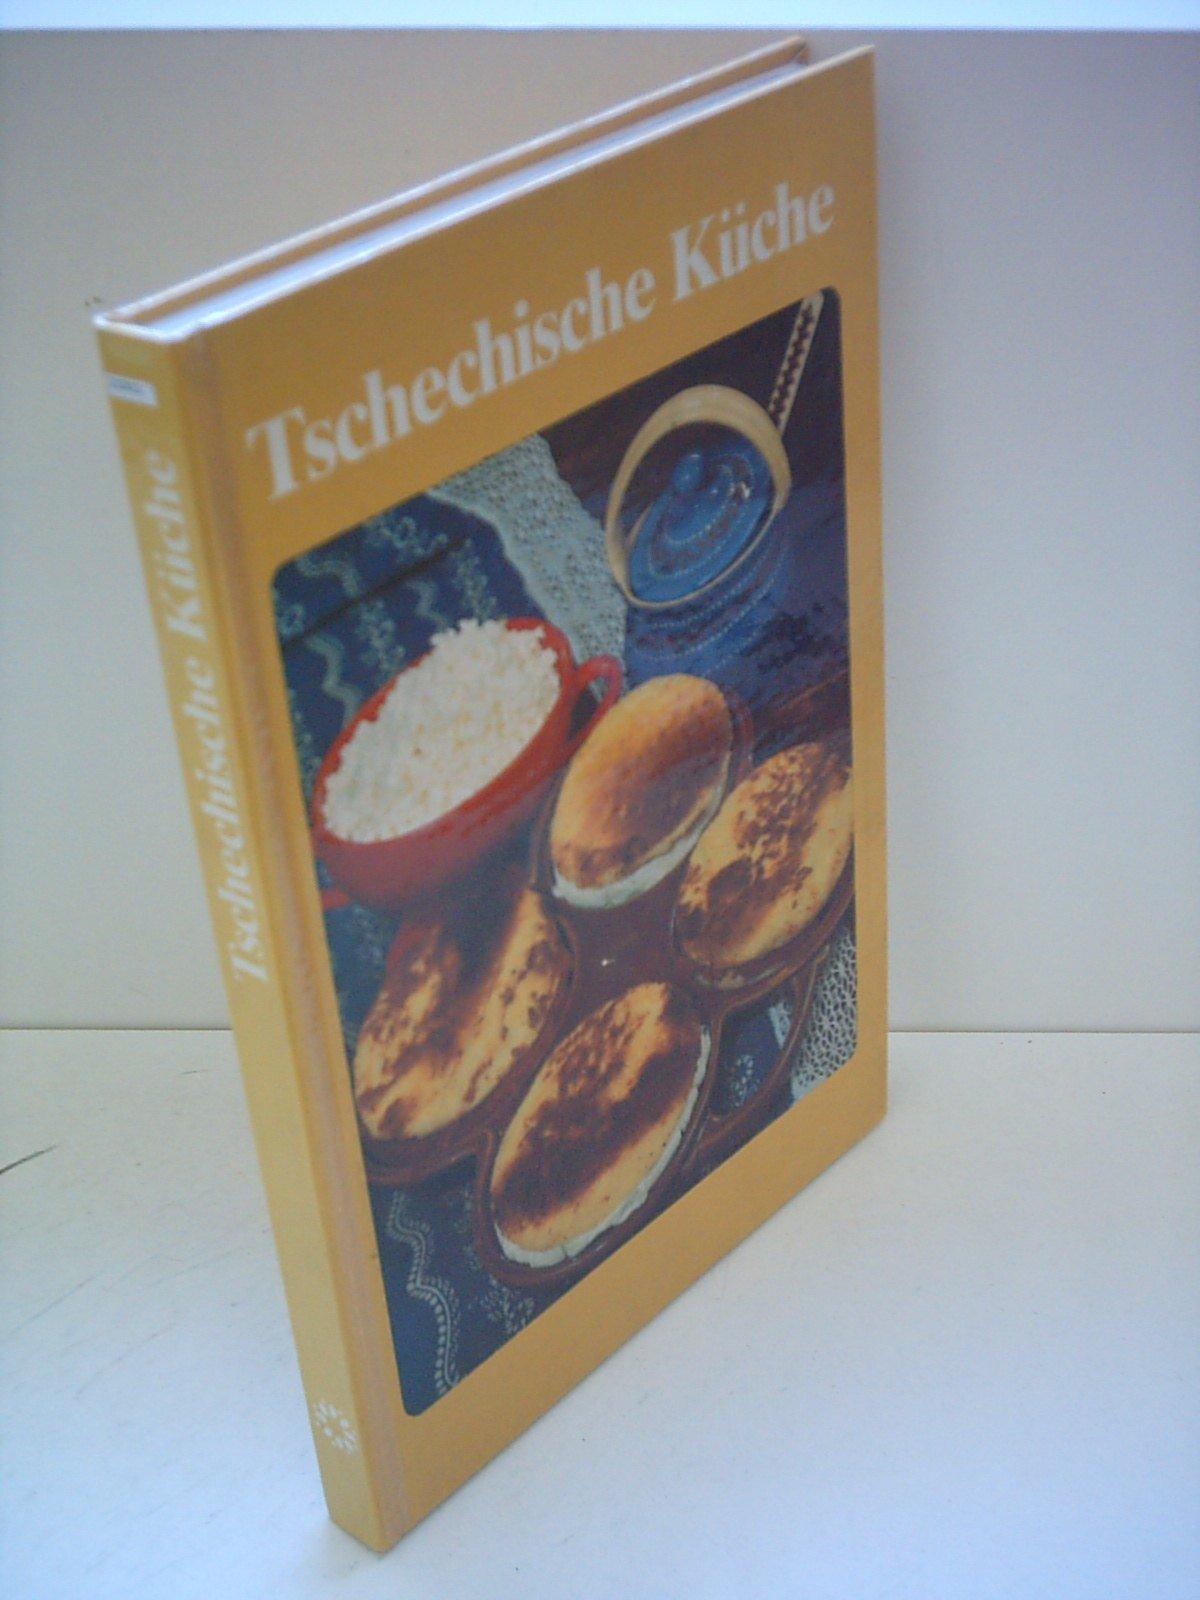 Tschechische Kuche Amazon De Maryna Klimentov Joza B R Zov Bucher